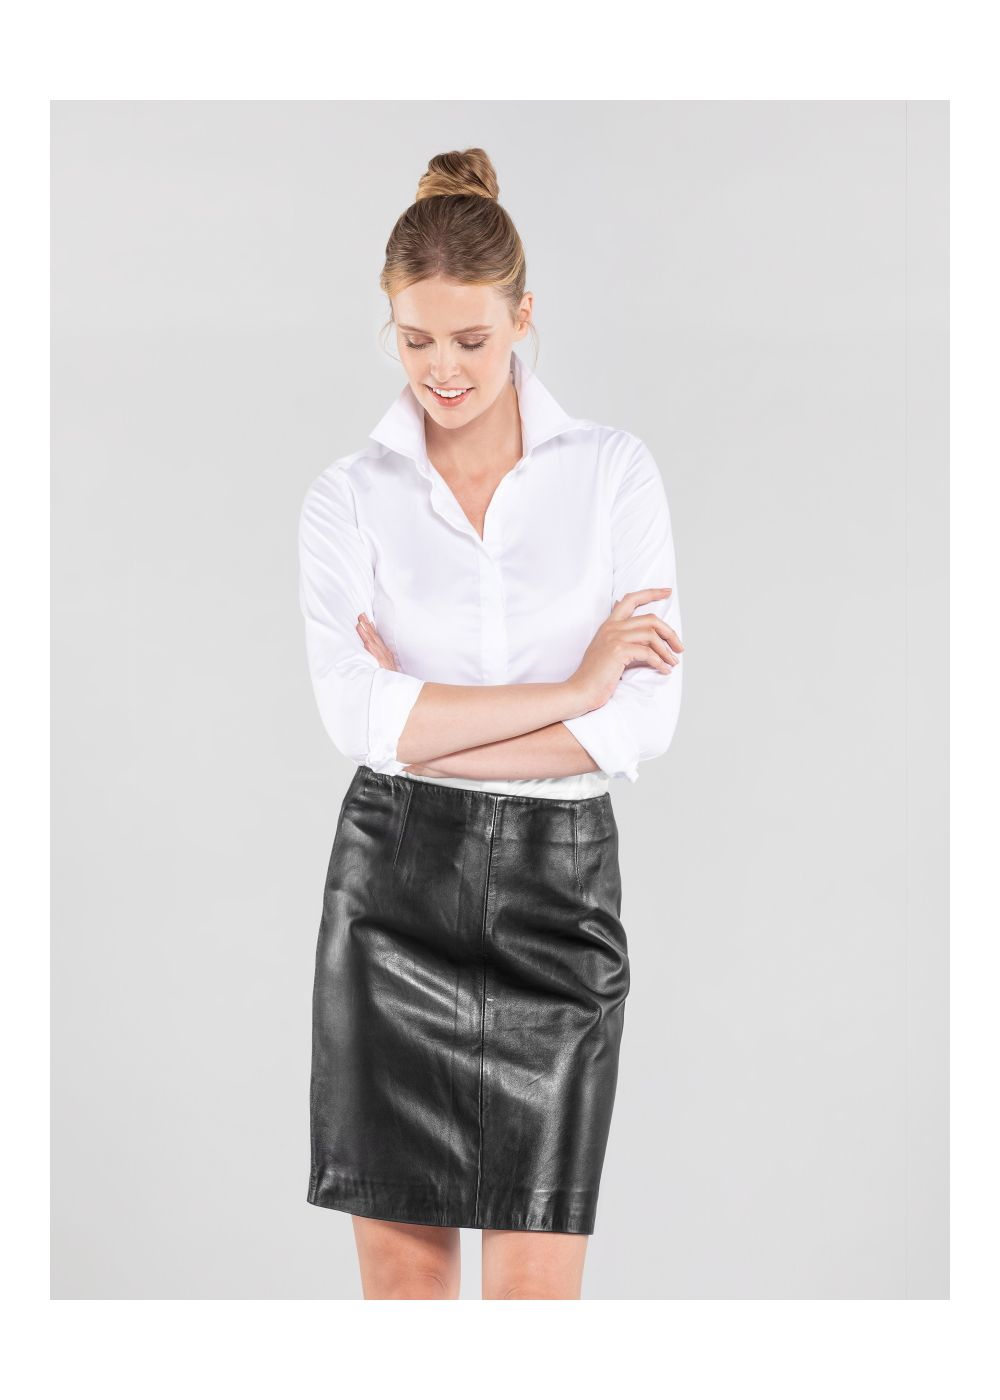 Spódnica damska SPCDS-0034-5480(Z20)